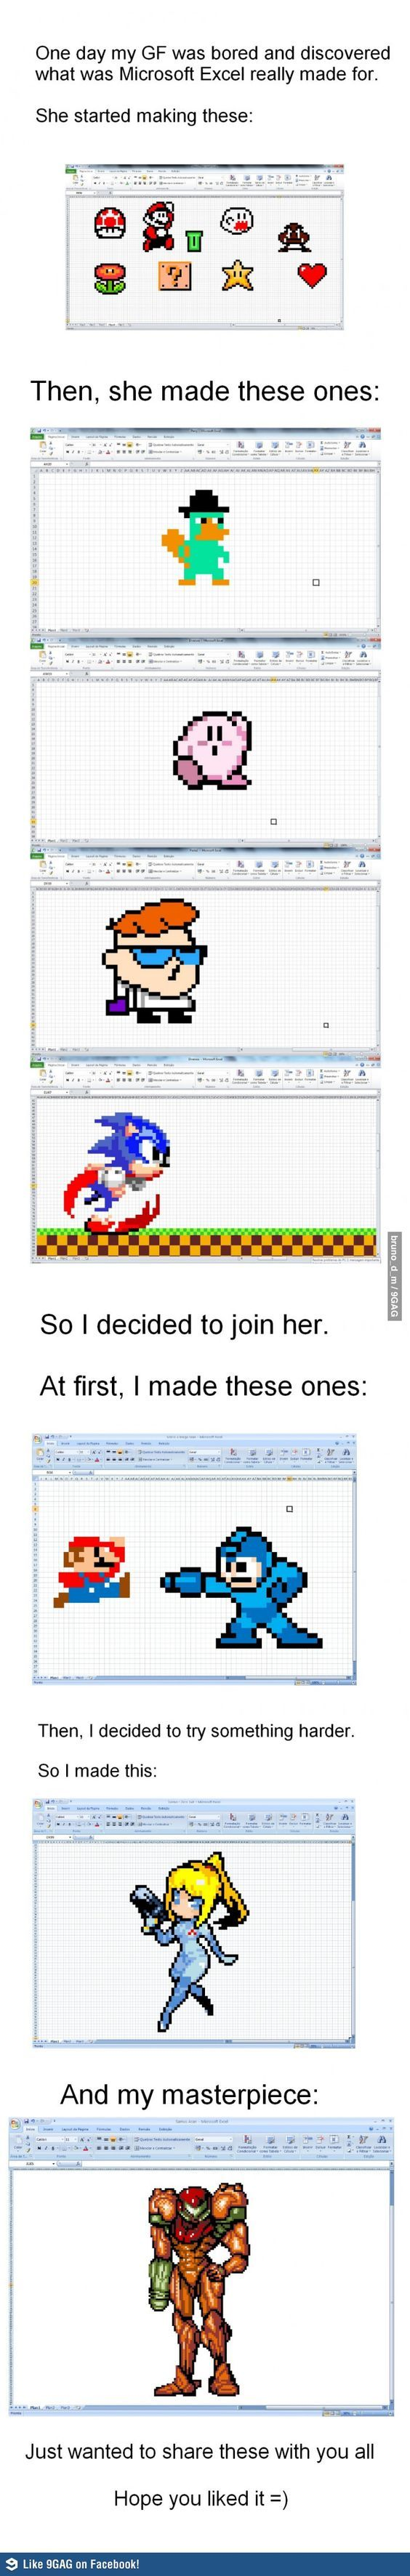 excel video games